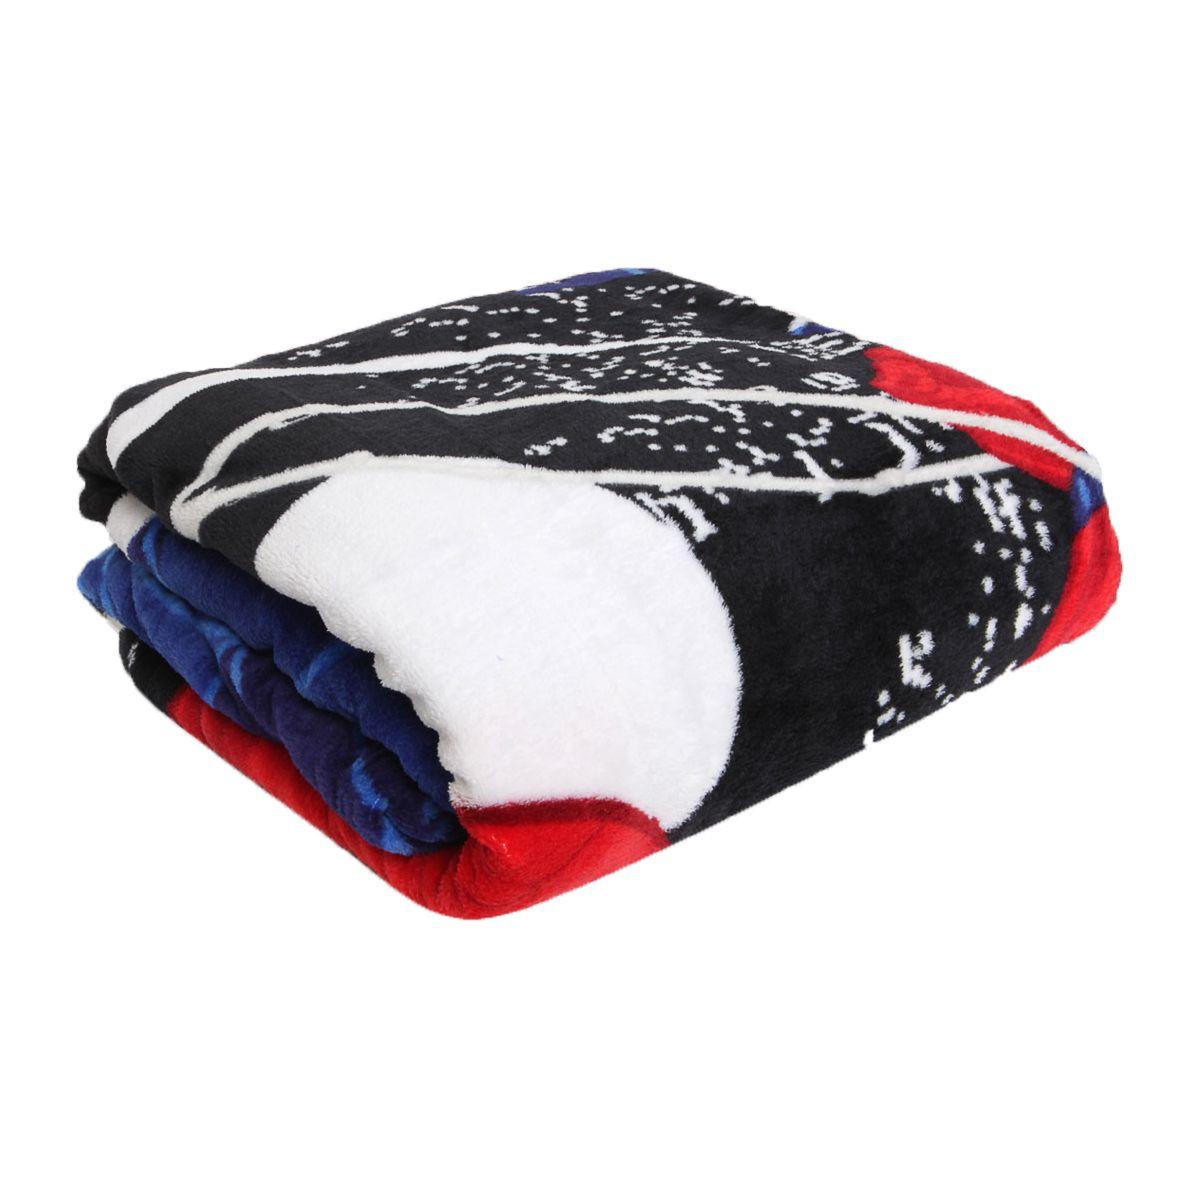 Cobertor Manta Fleece Spider Man Homem Aranha Infantil Lepper